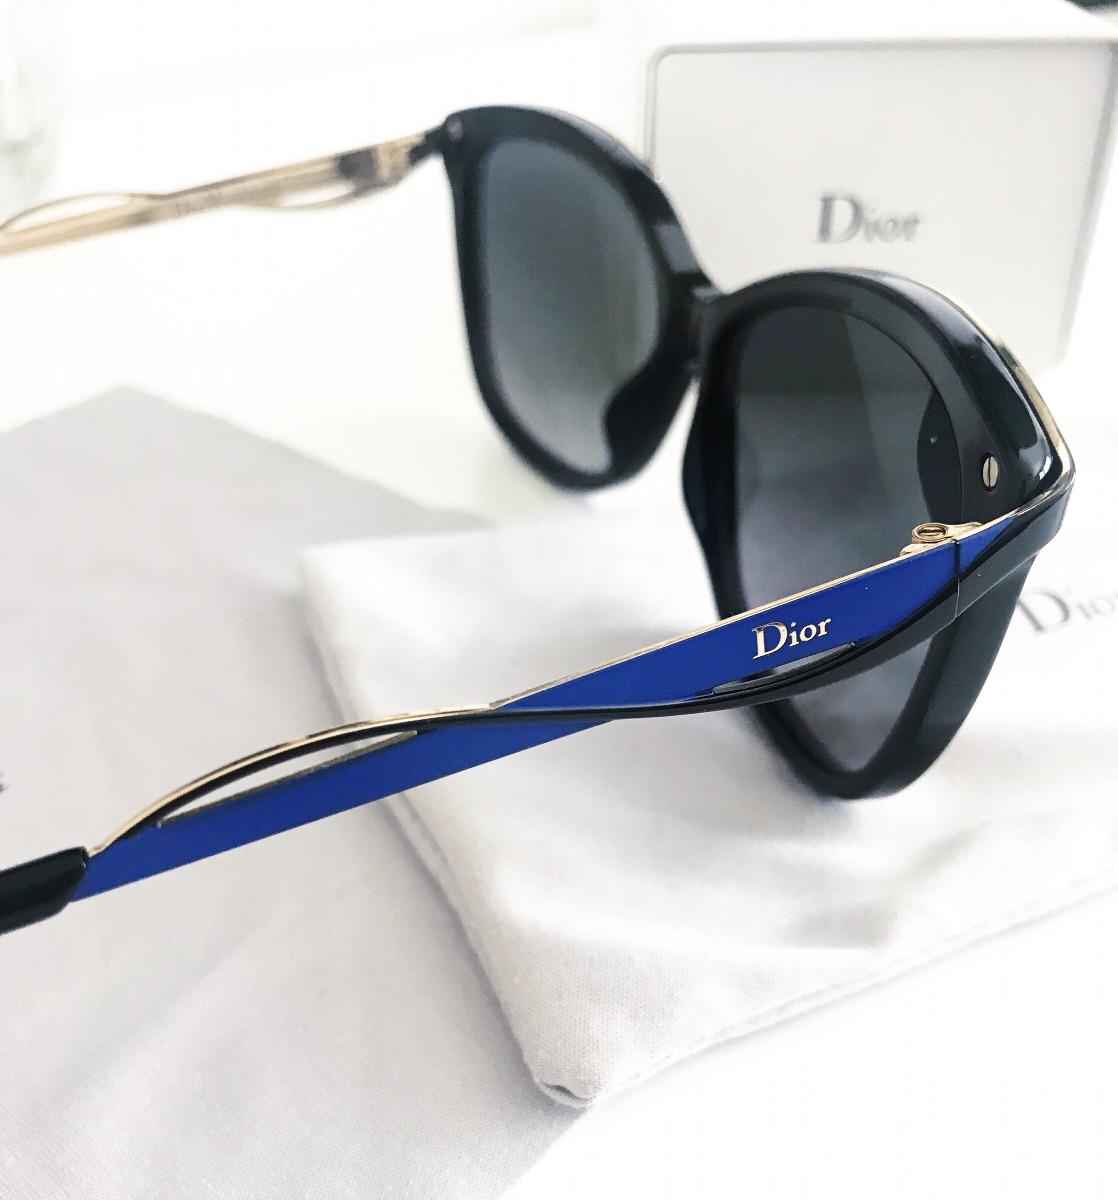 276ef89d1c Lentes Dior Originales Cat Eye Acetate Para Mujer - $ 4,300.00 en ...